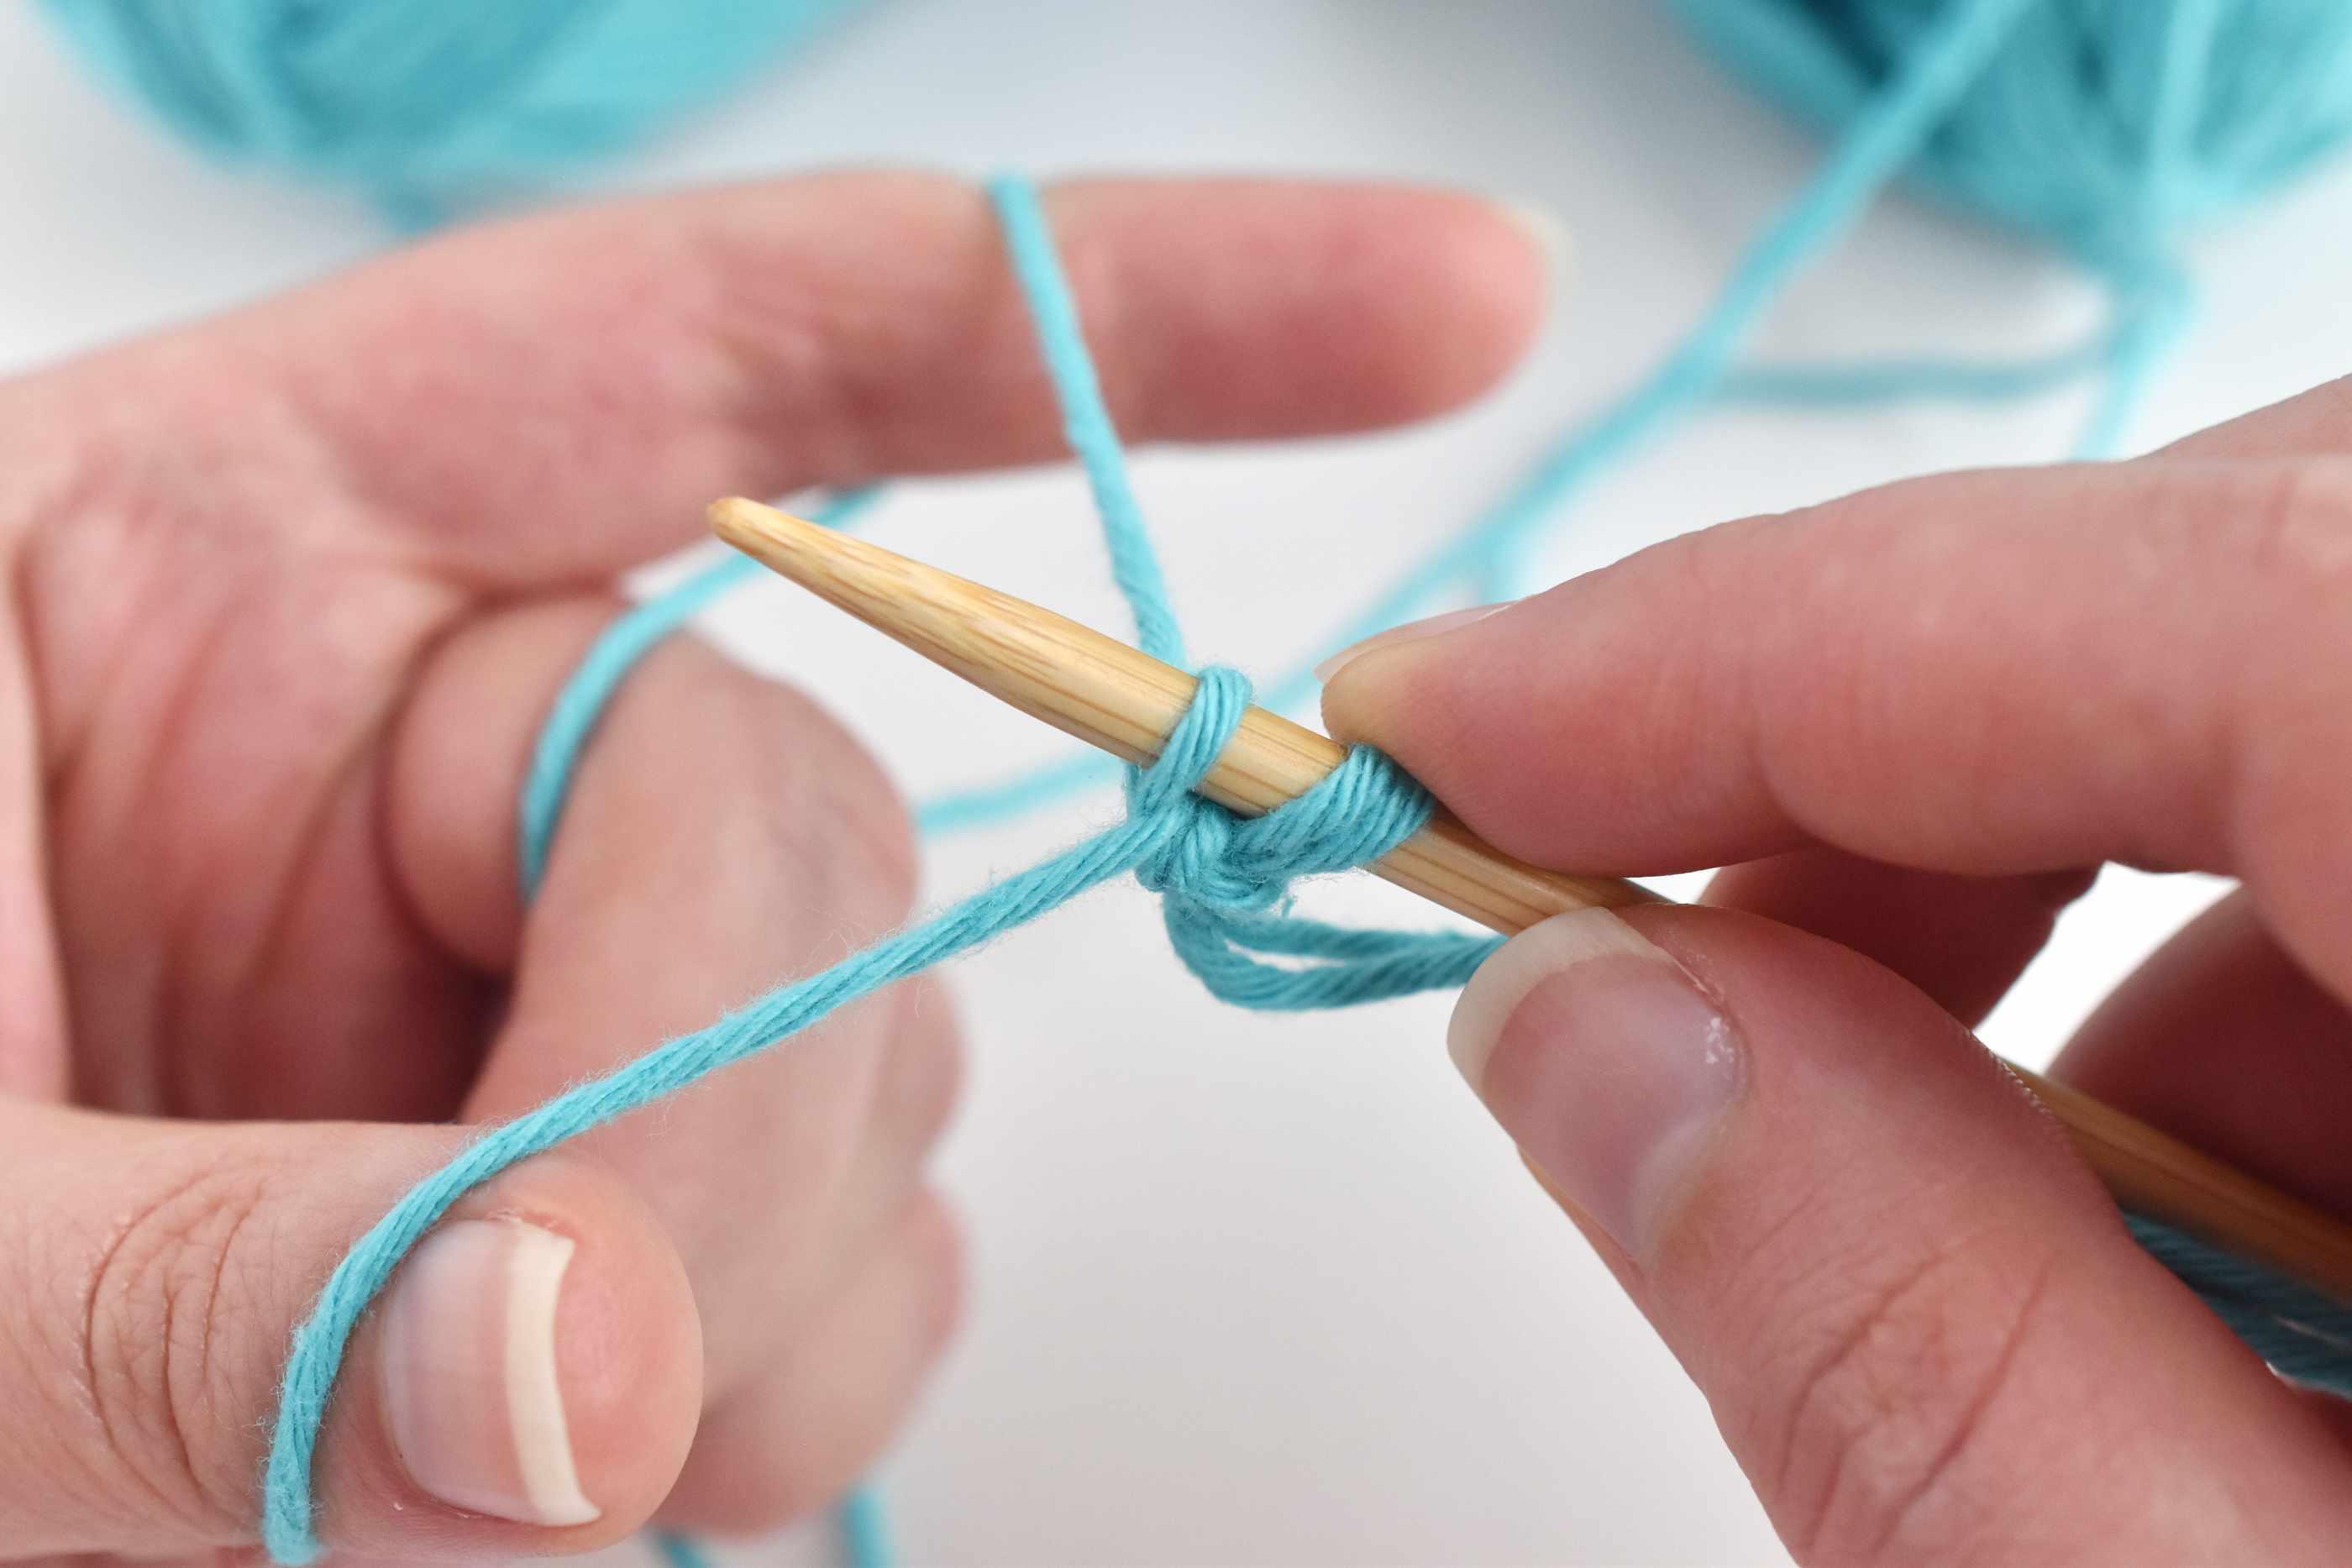 One Stitch Cast on the Needle